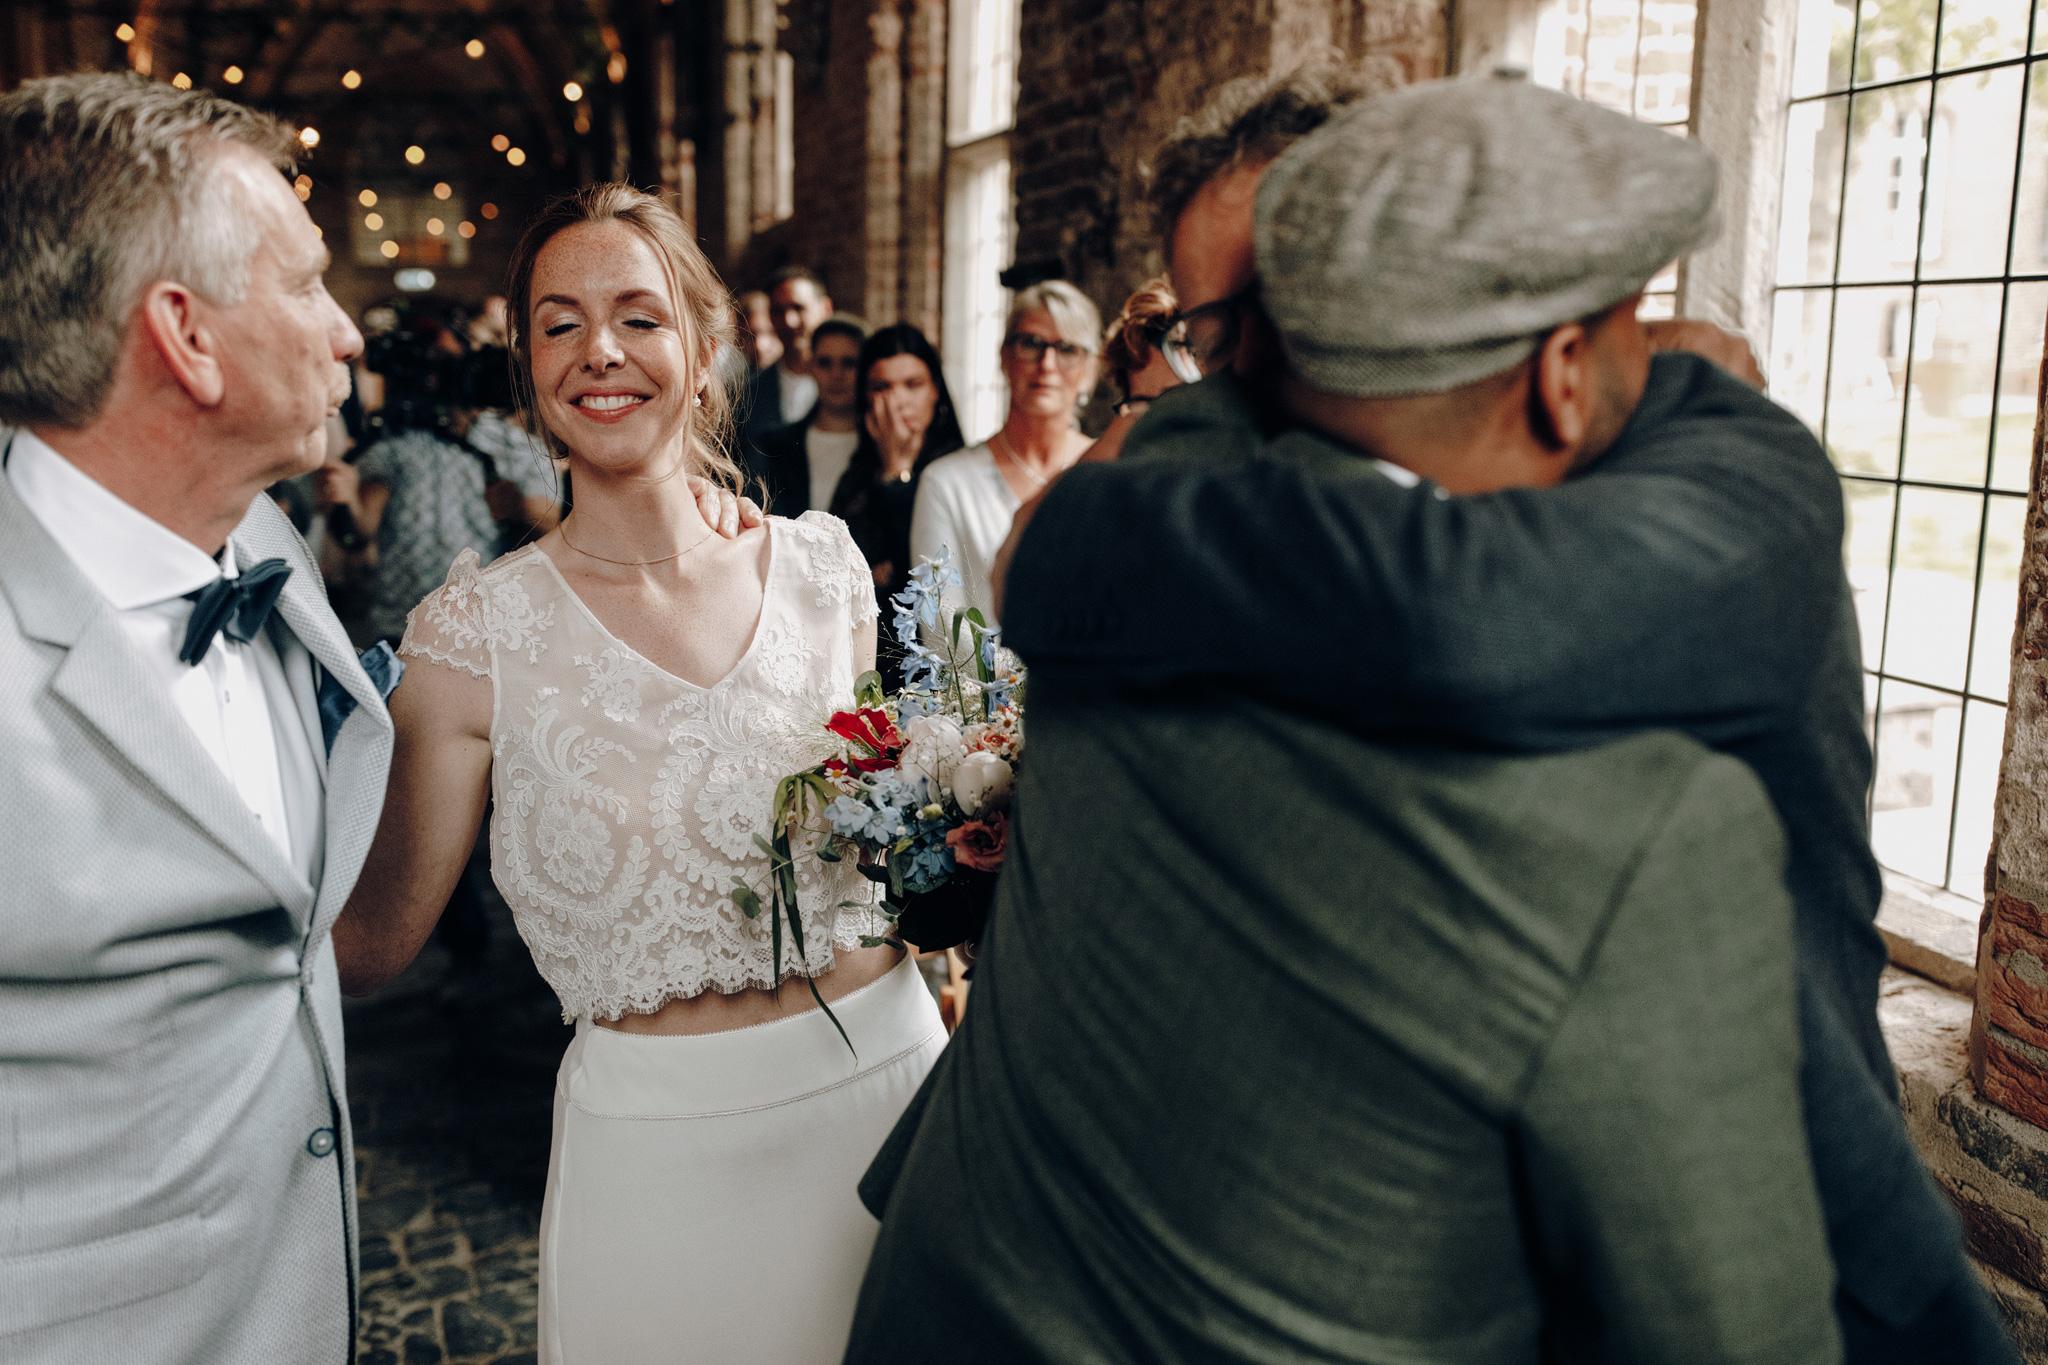 Bruid lacht naar vader tijdens trouwceremonie Kloster Graefenthal